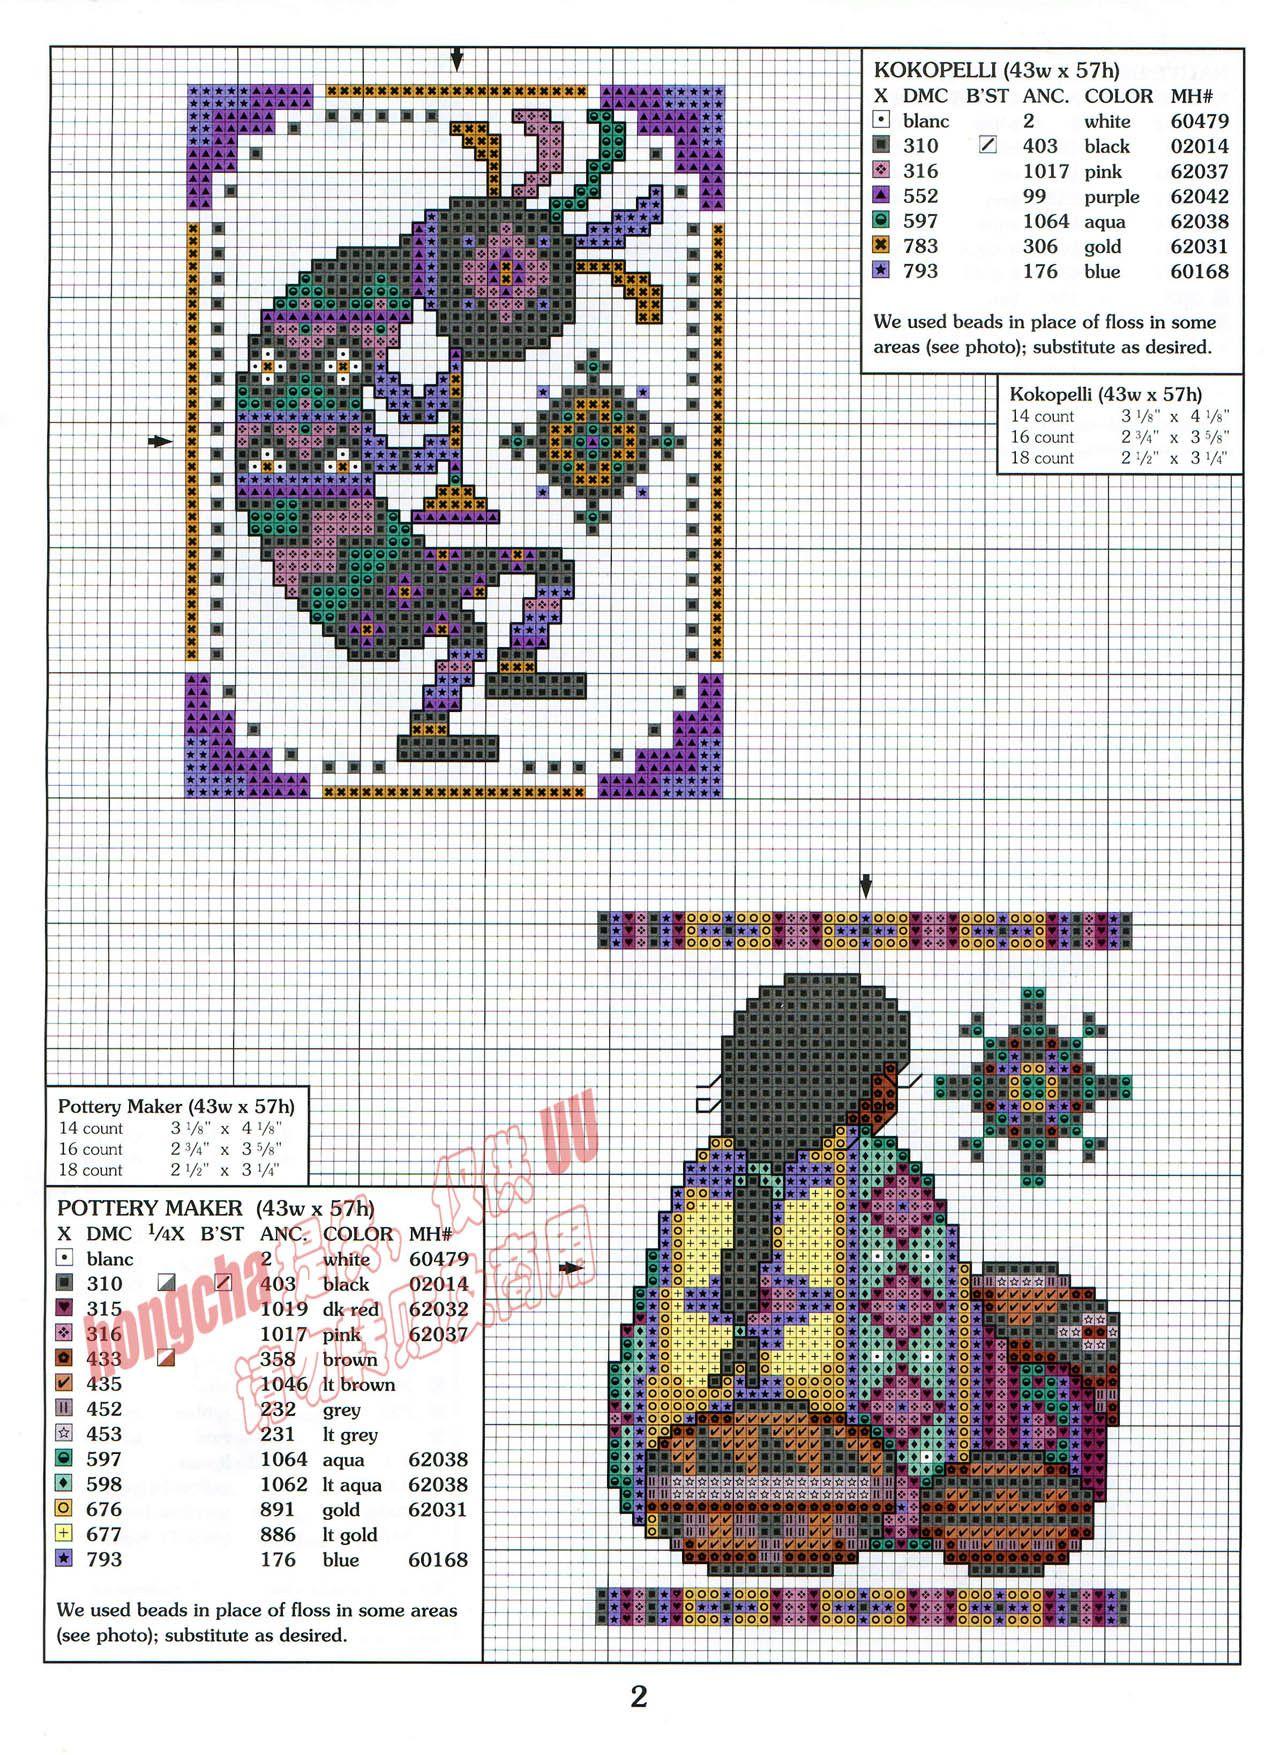 Southwest Stitches 3 Of 5 Cross Stitch Cross Stitch